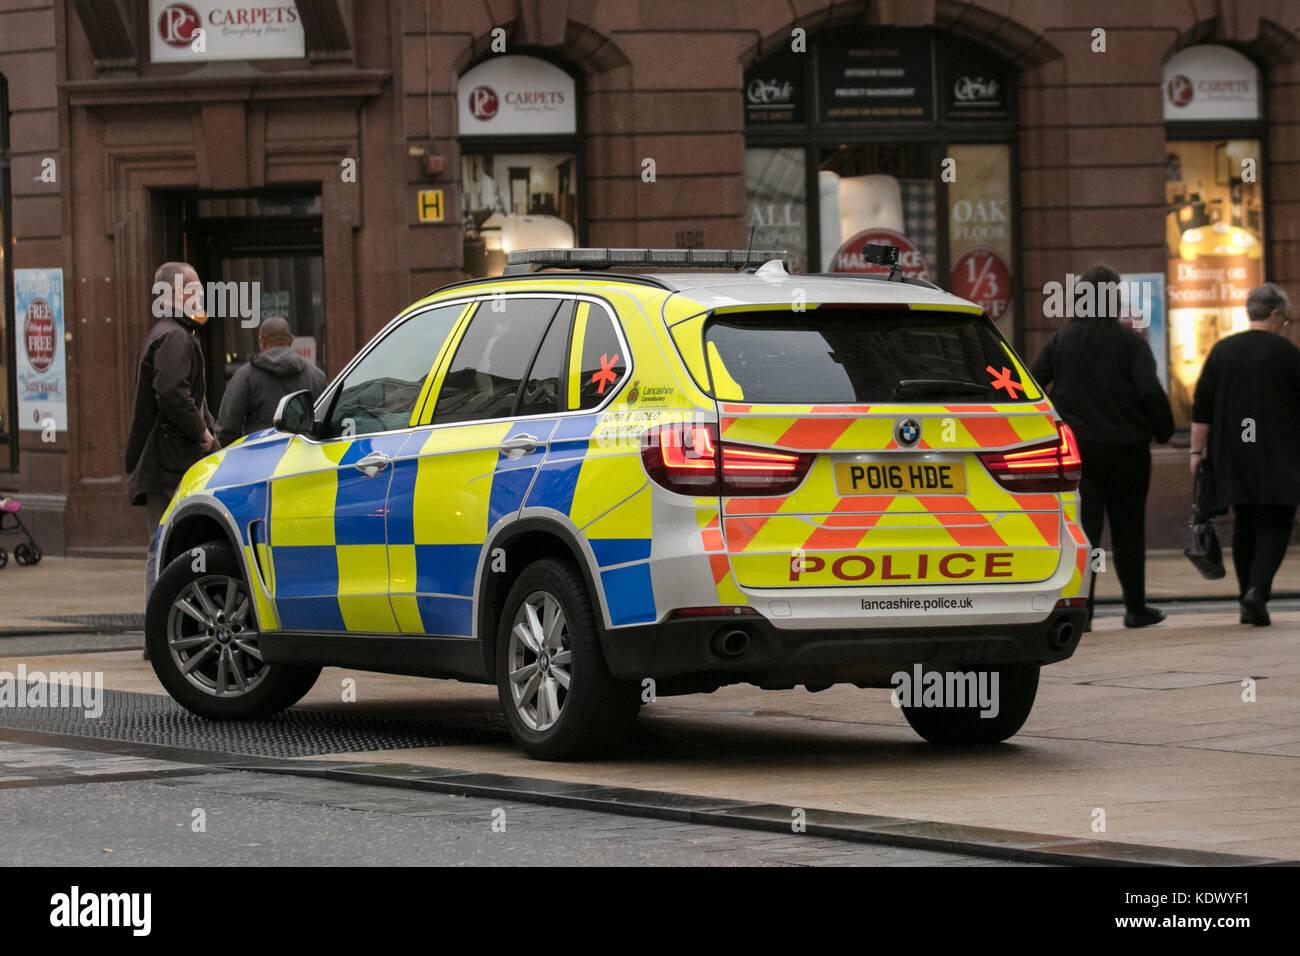 Red Star Recognition Sticker For Armed Police In ANPR U0026 Video Response  Patrol Vehicle, Preston UK